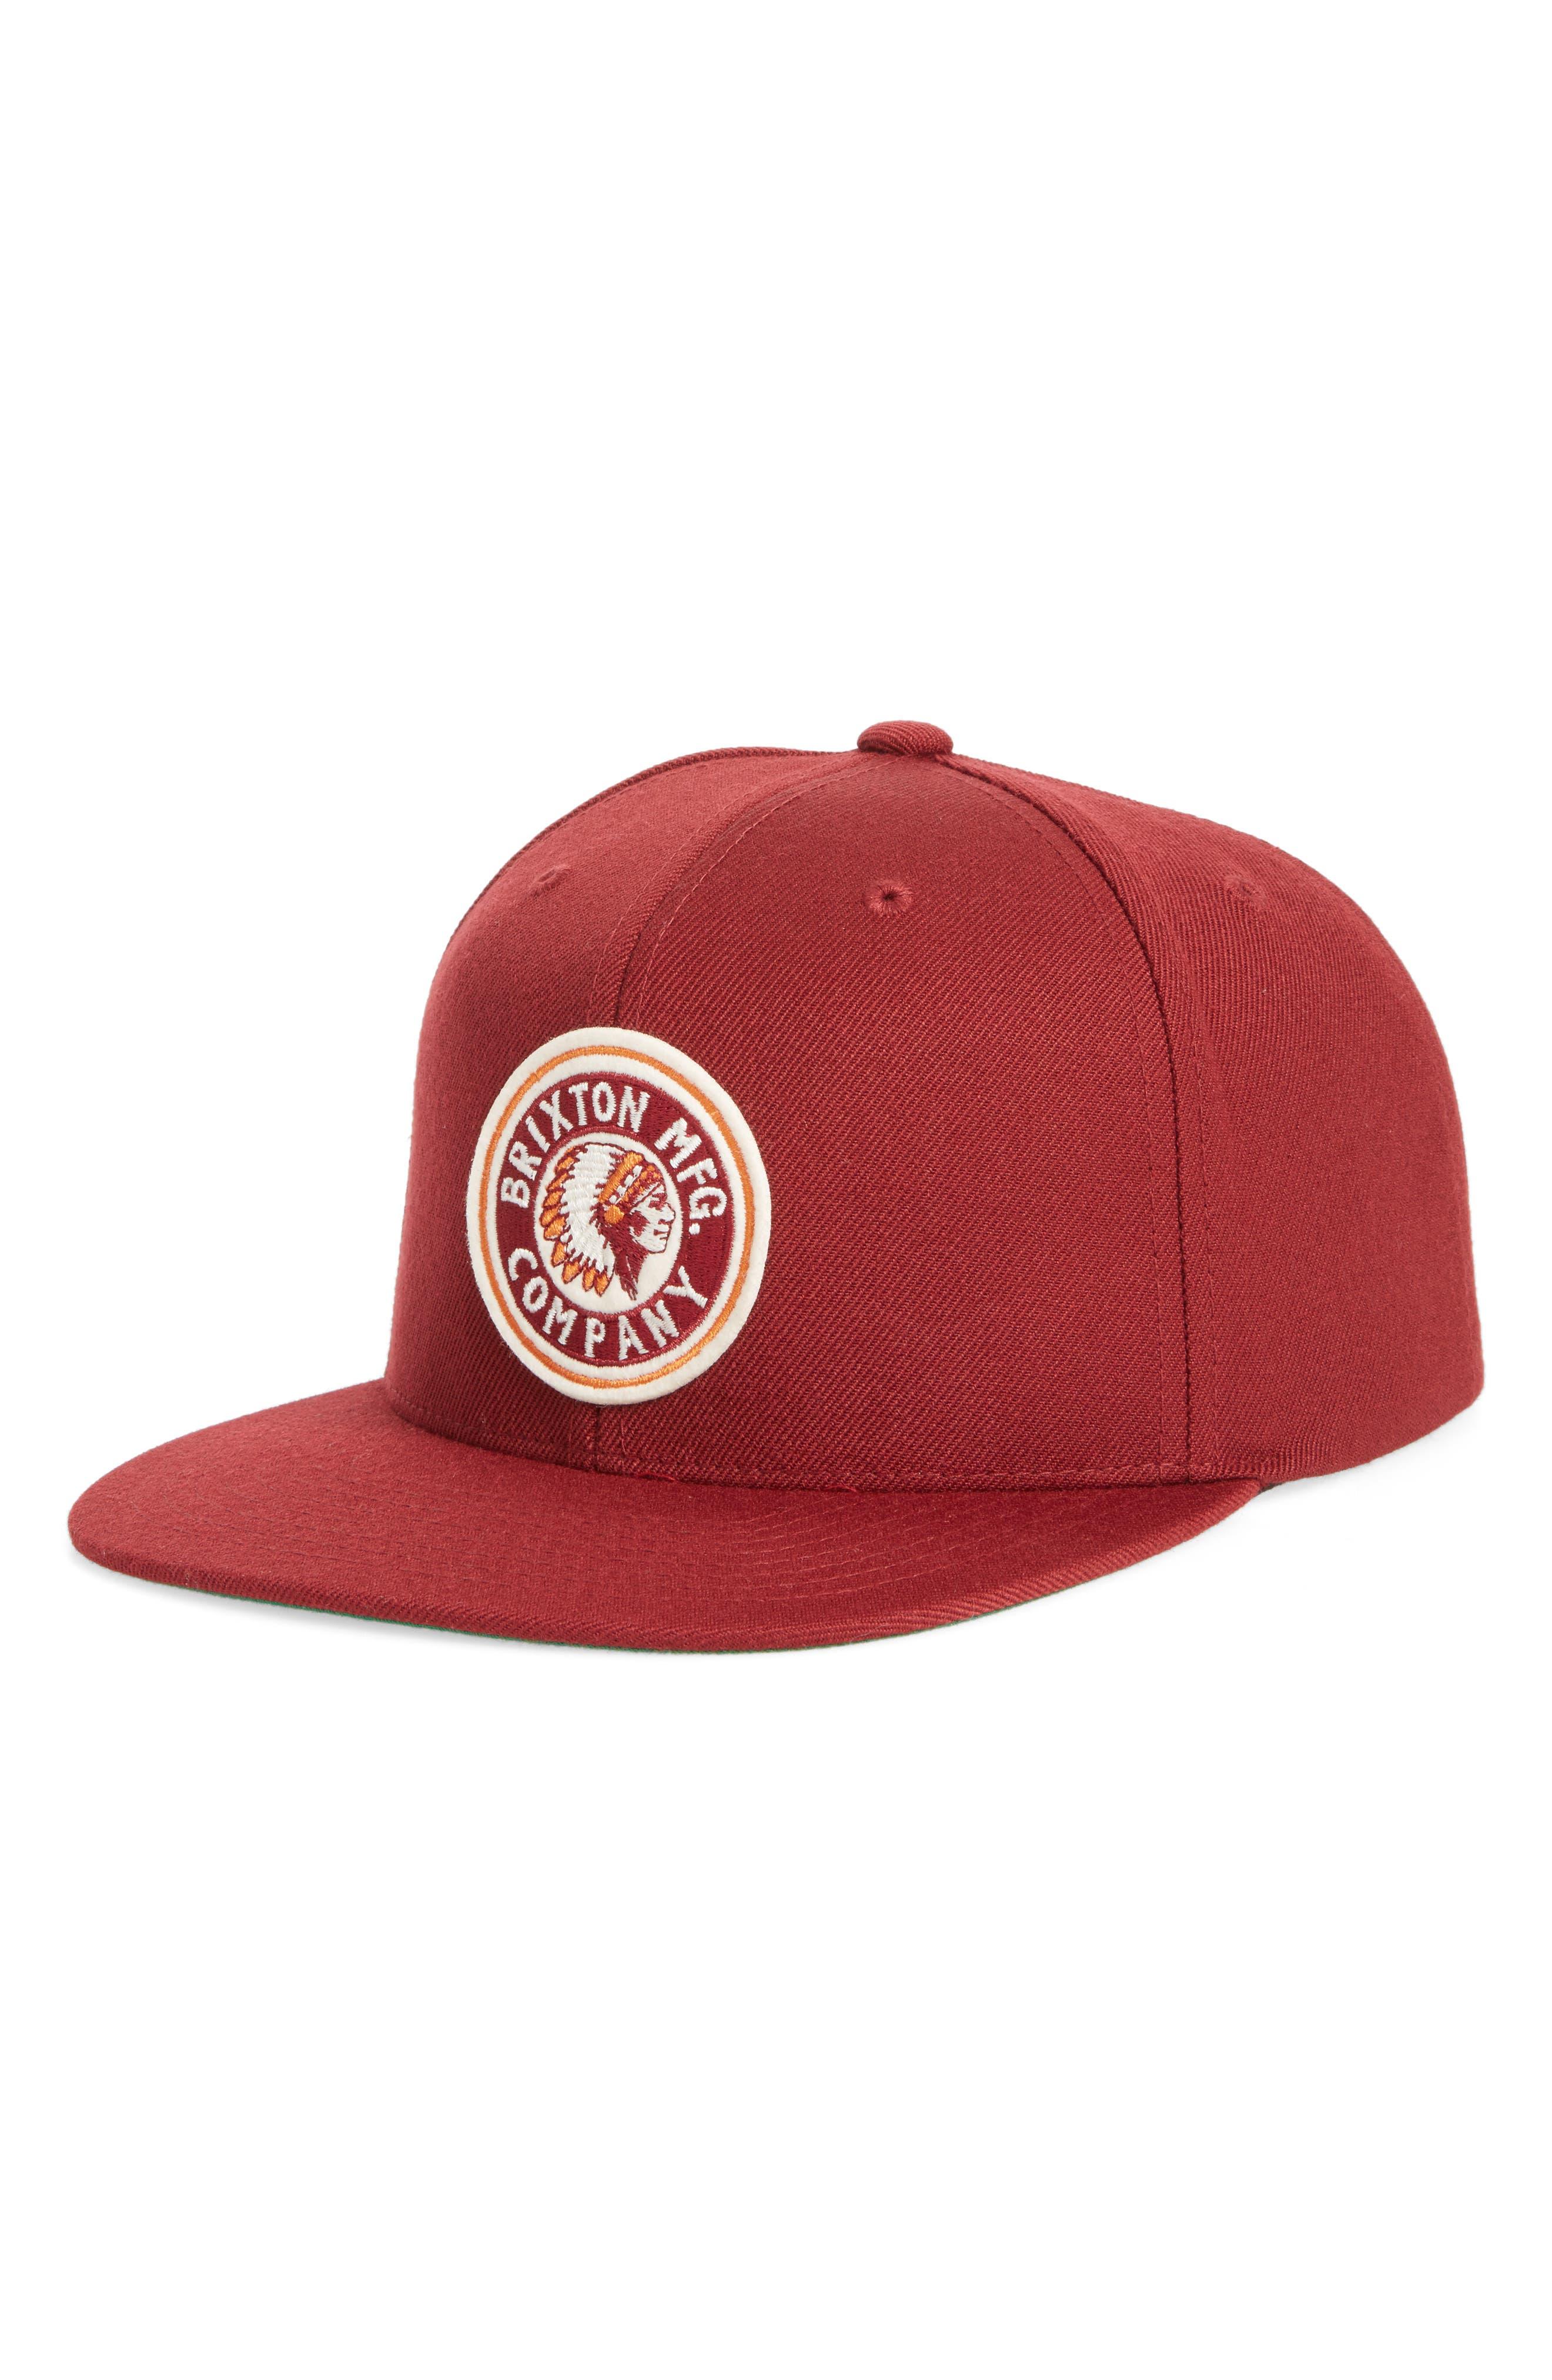 'Rival' Snapback Baseball Cap,                         Main,                         color, Burgundy/ Cream